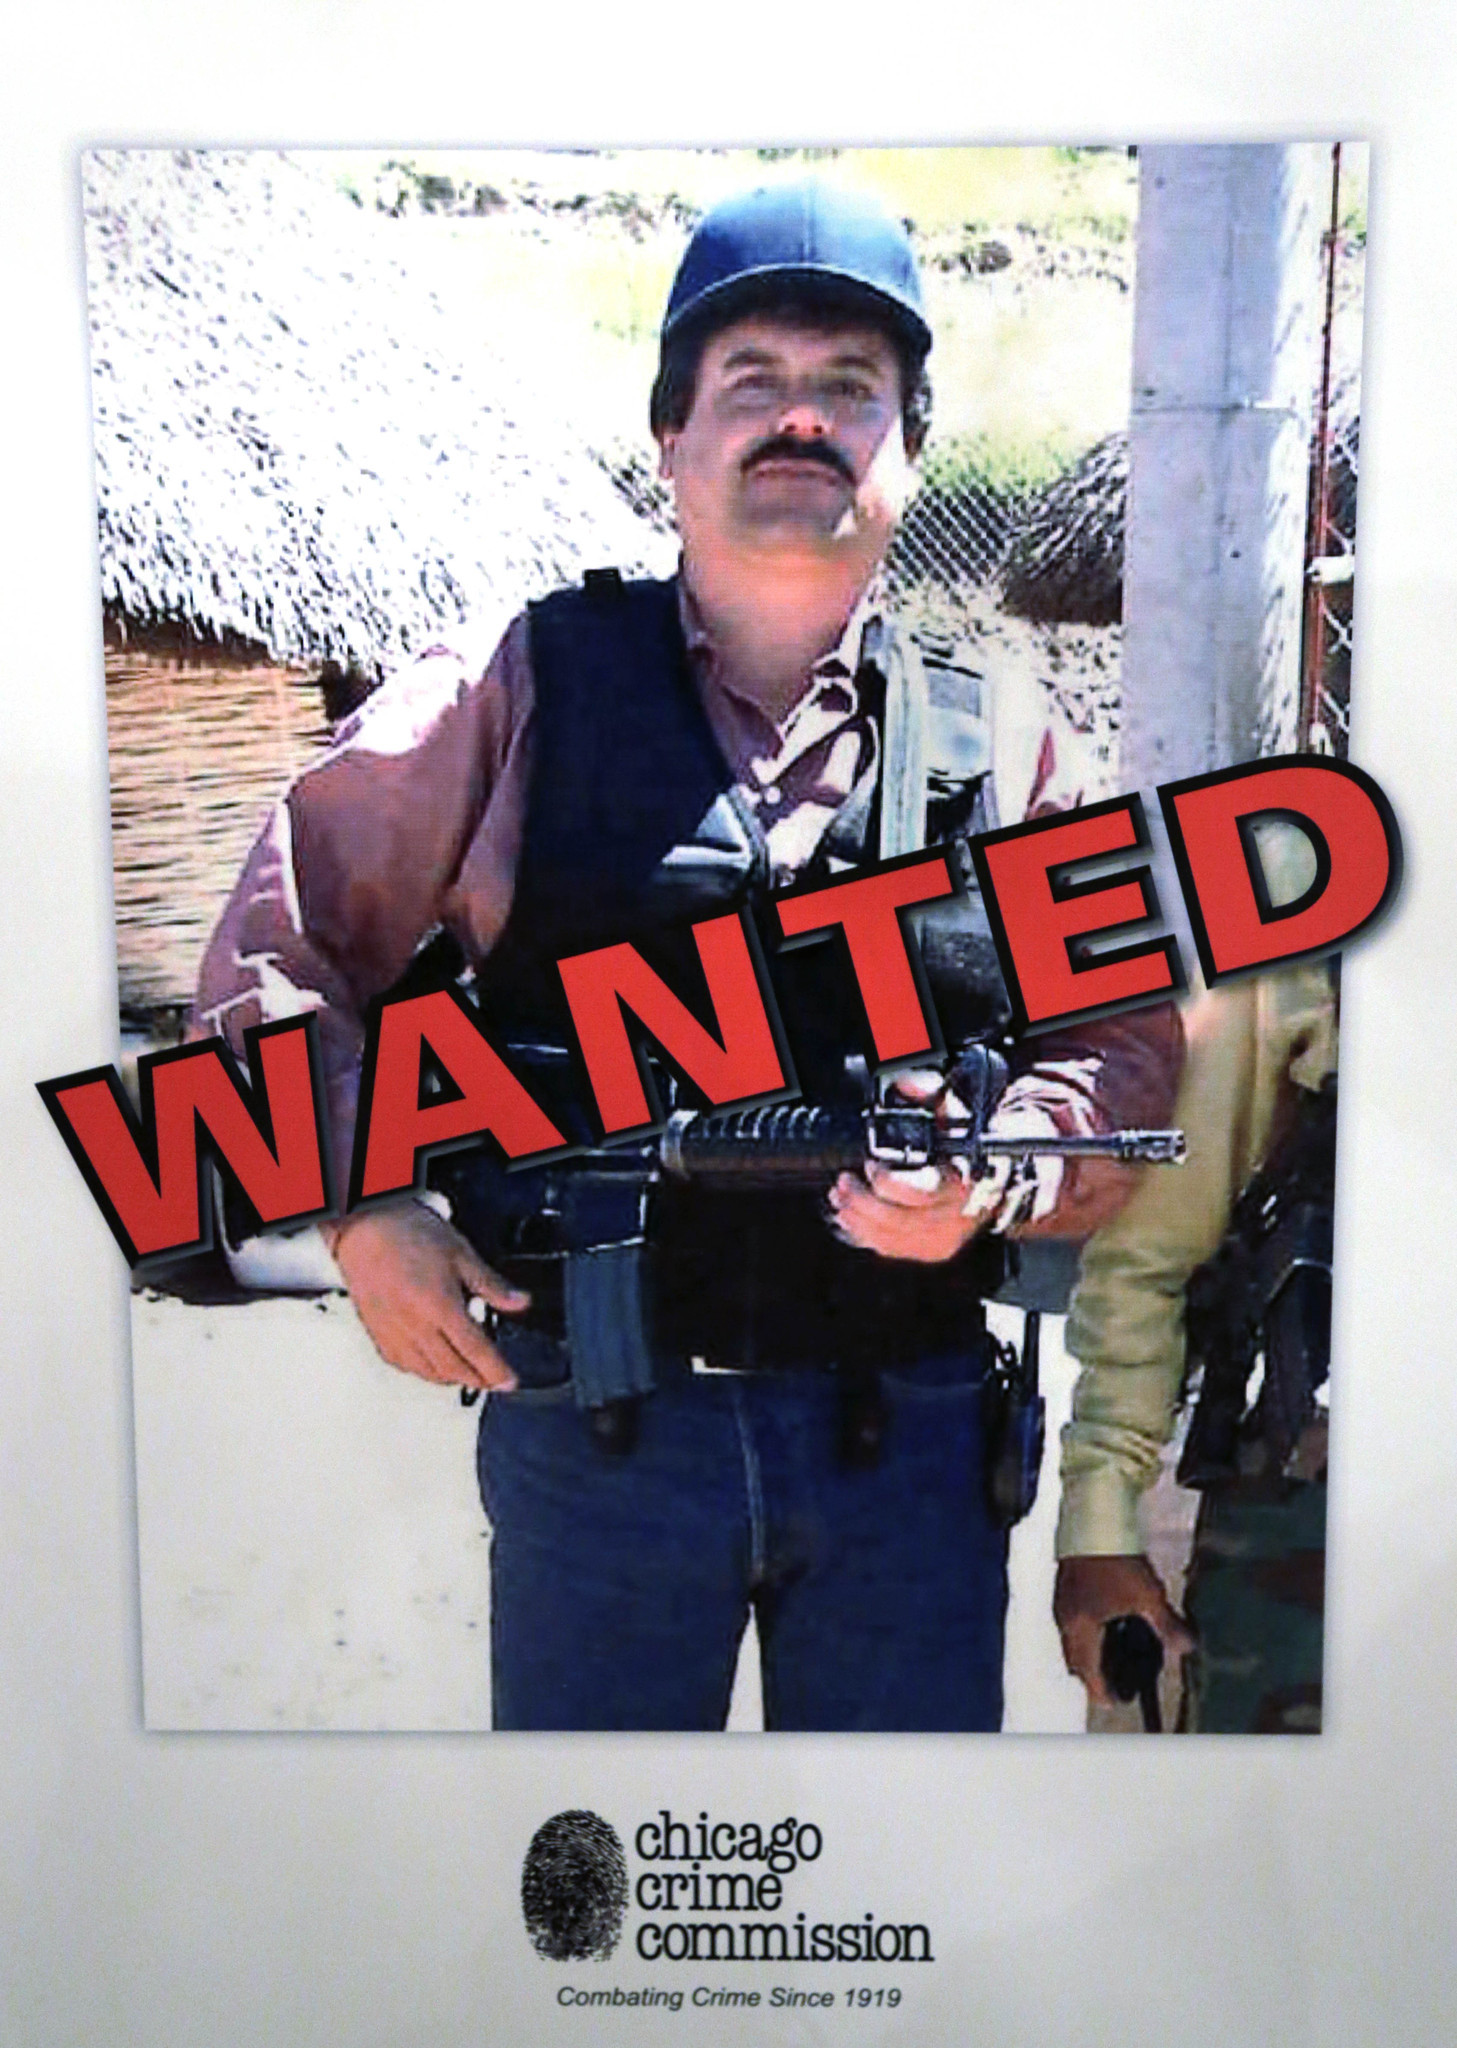 u0026 39 el chapo u0026 39  prison escape a strong blow to mexico u0026 39 s